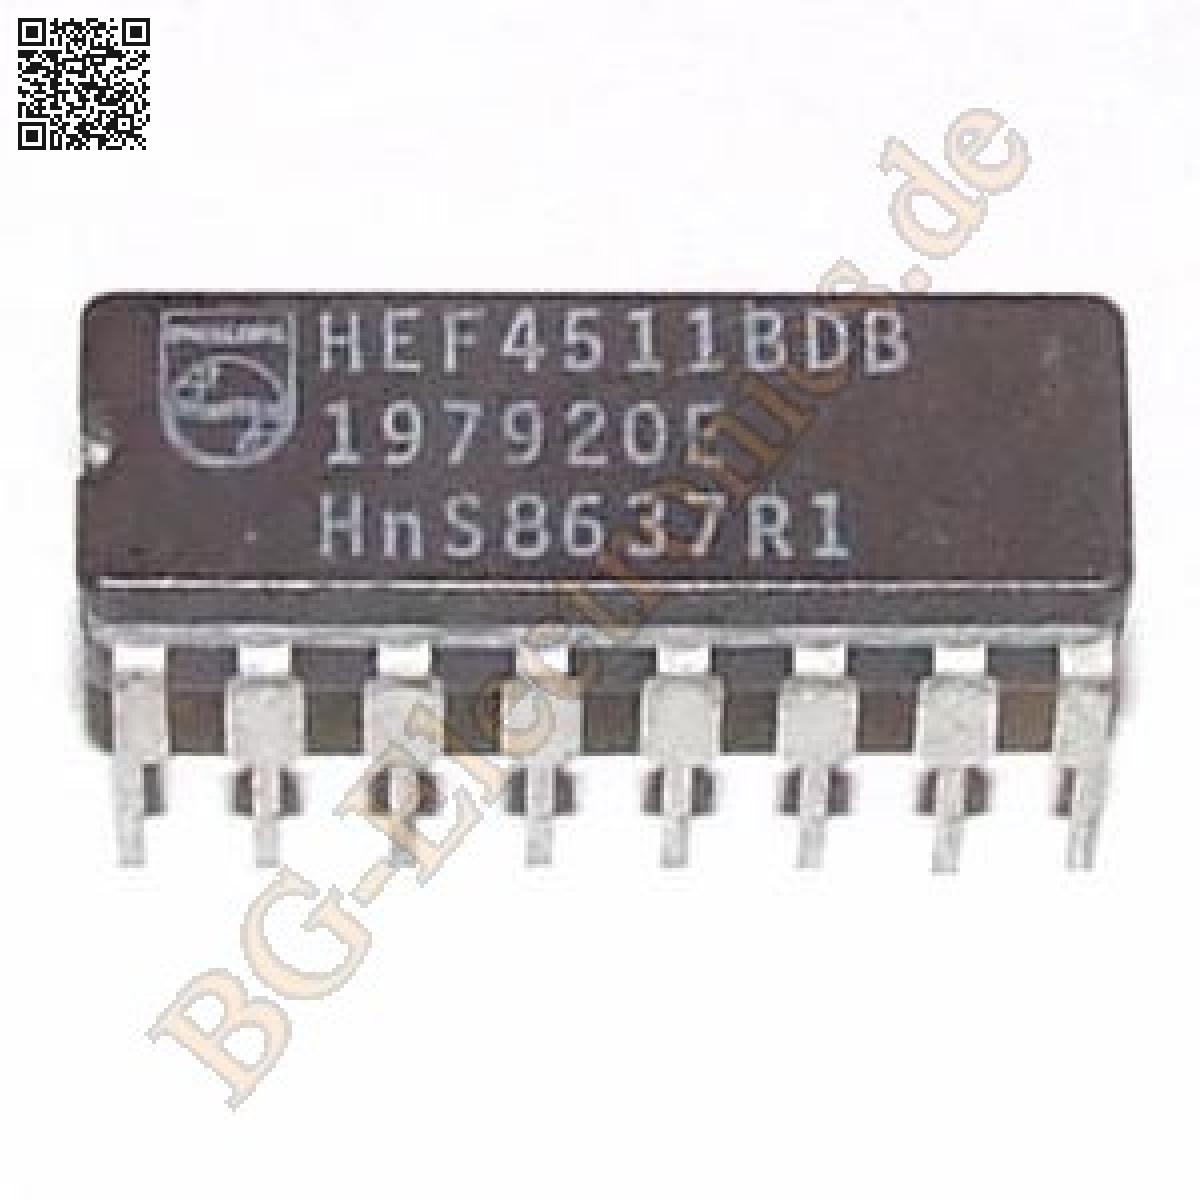 1-x-HEF4511BDB-BCD-to-7-segment-latch-decoder-driver-Philips-CDIP-16-1pcs